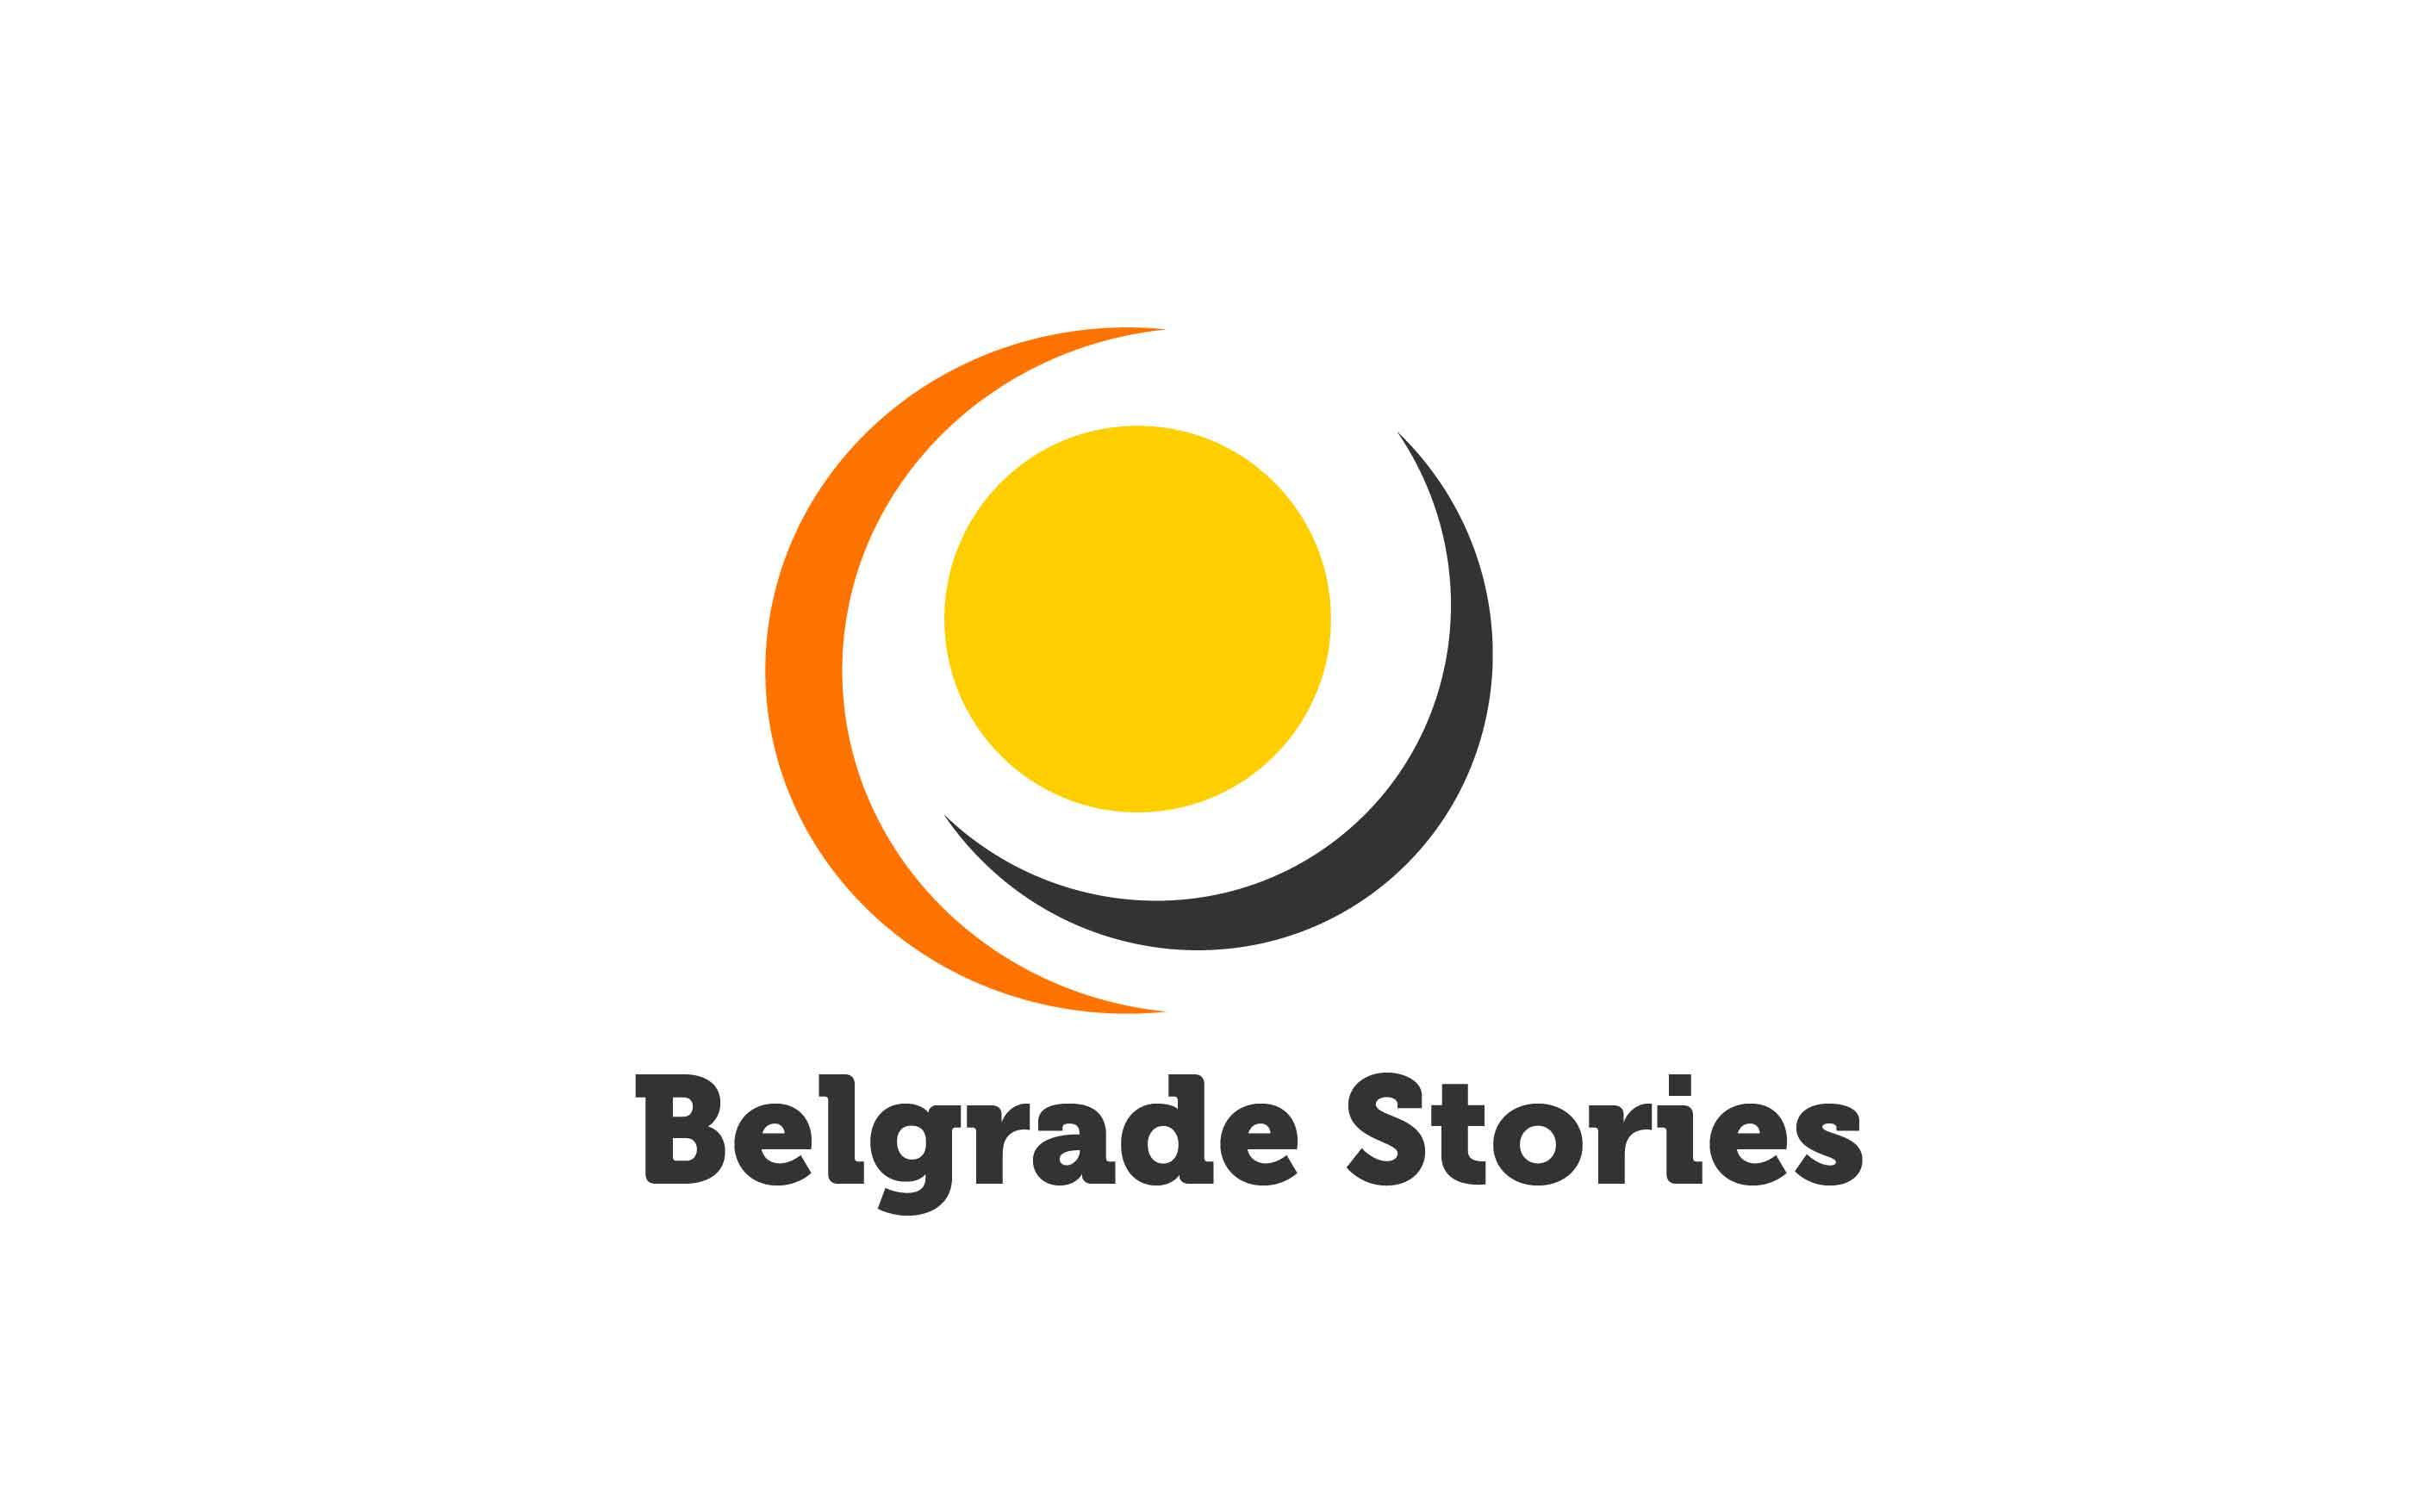 Логотип для агентства городских туров в Белграде фото f_758589b1fccbbc1d.jpg